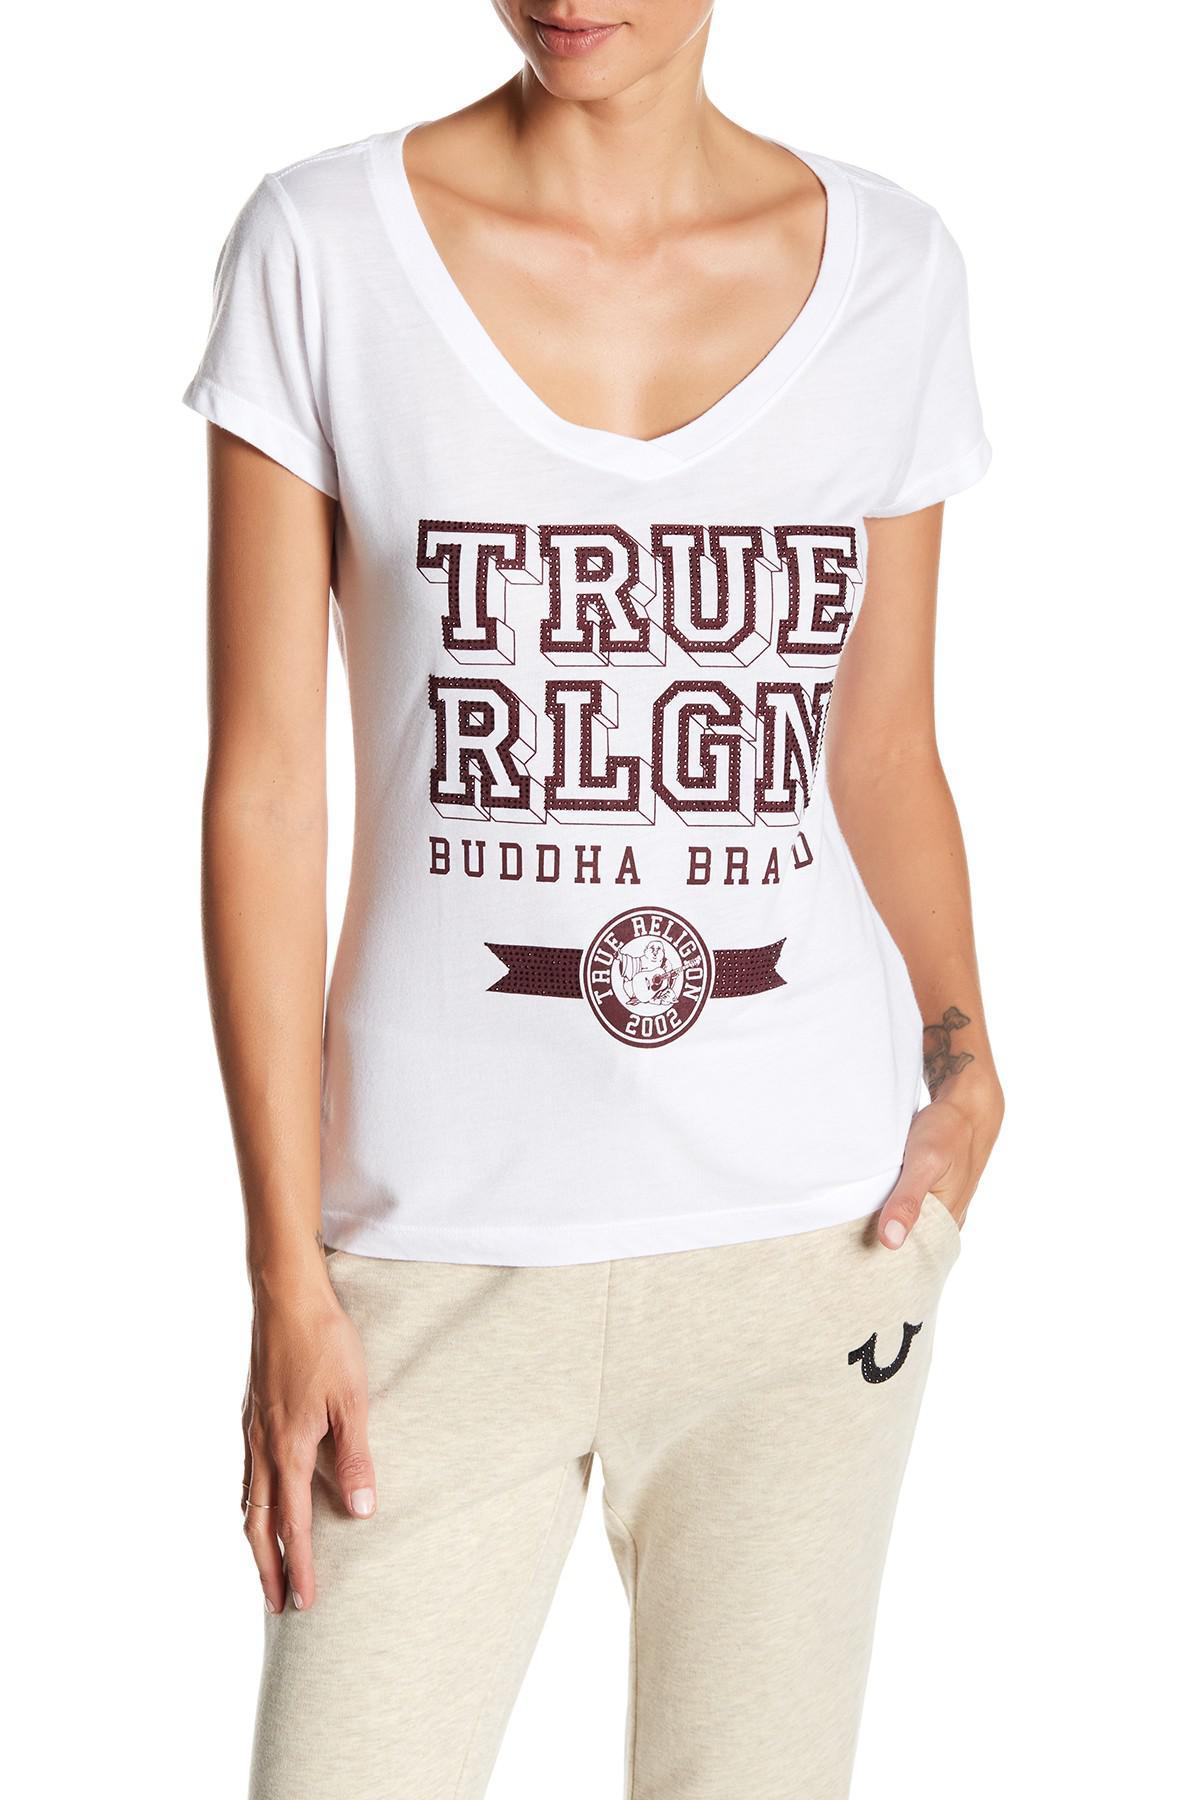 true religion rounded v neck gemstone tee in white lyst. Black Bedroom Furniture Sets. Home Design Ideas